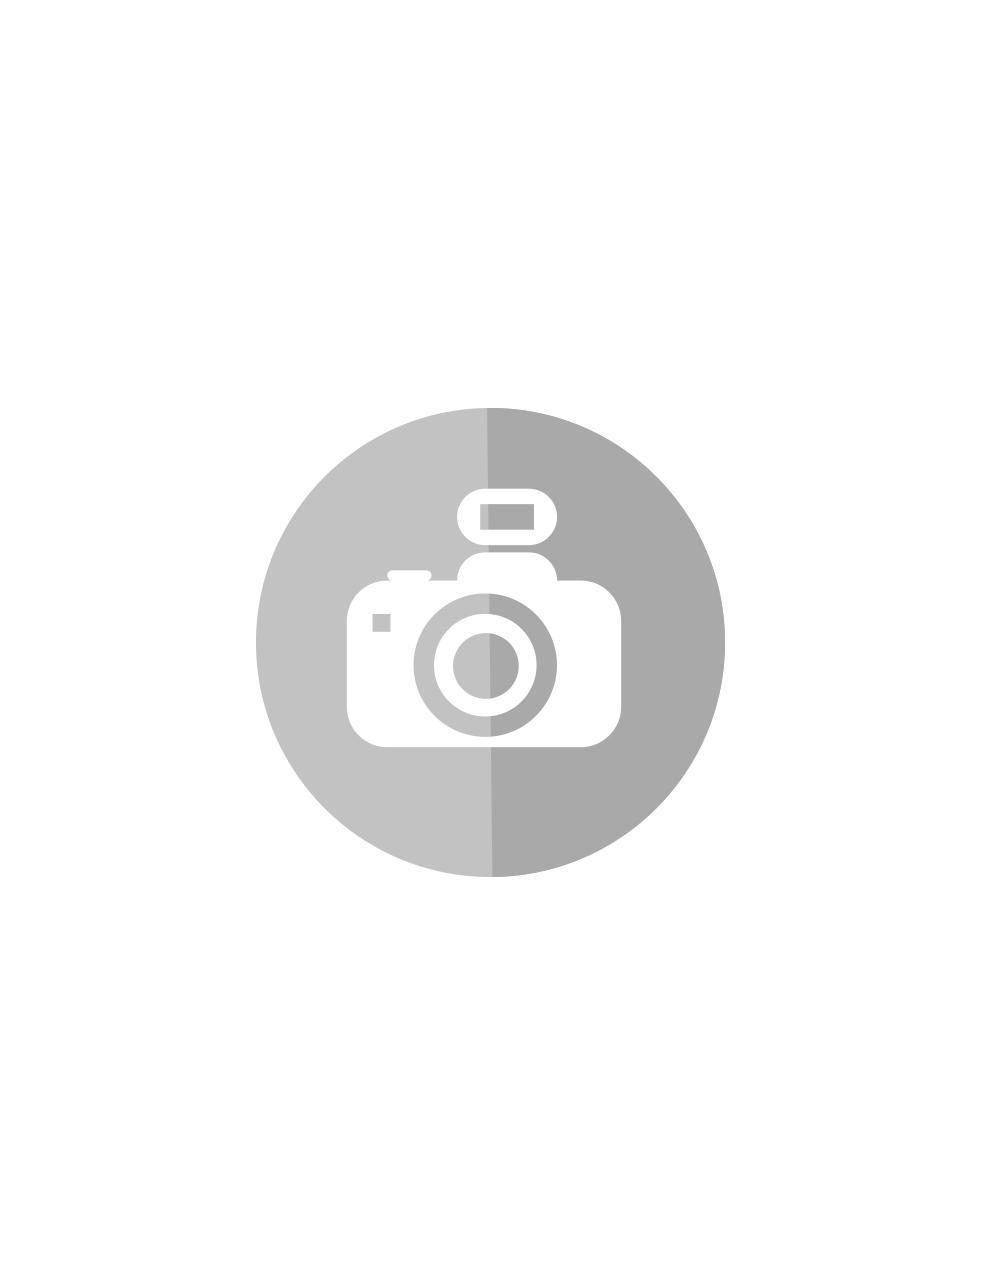 30215343_sparepart/HELMET: FIREMAN